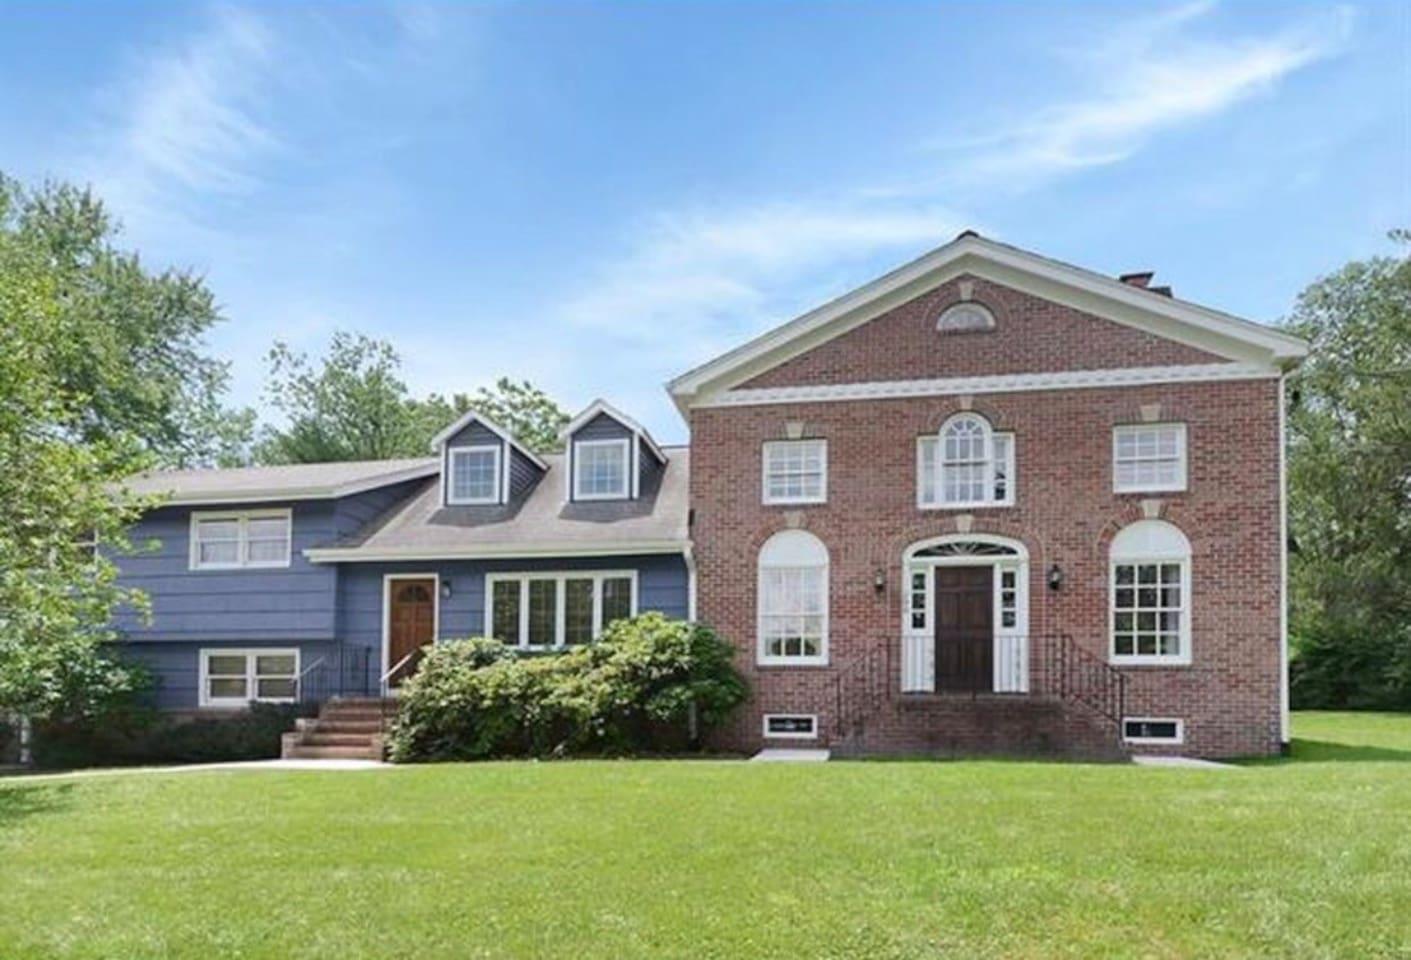 Blue House with a spacious backyard area